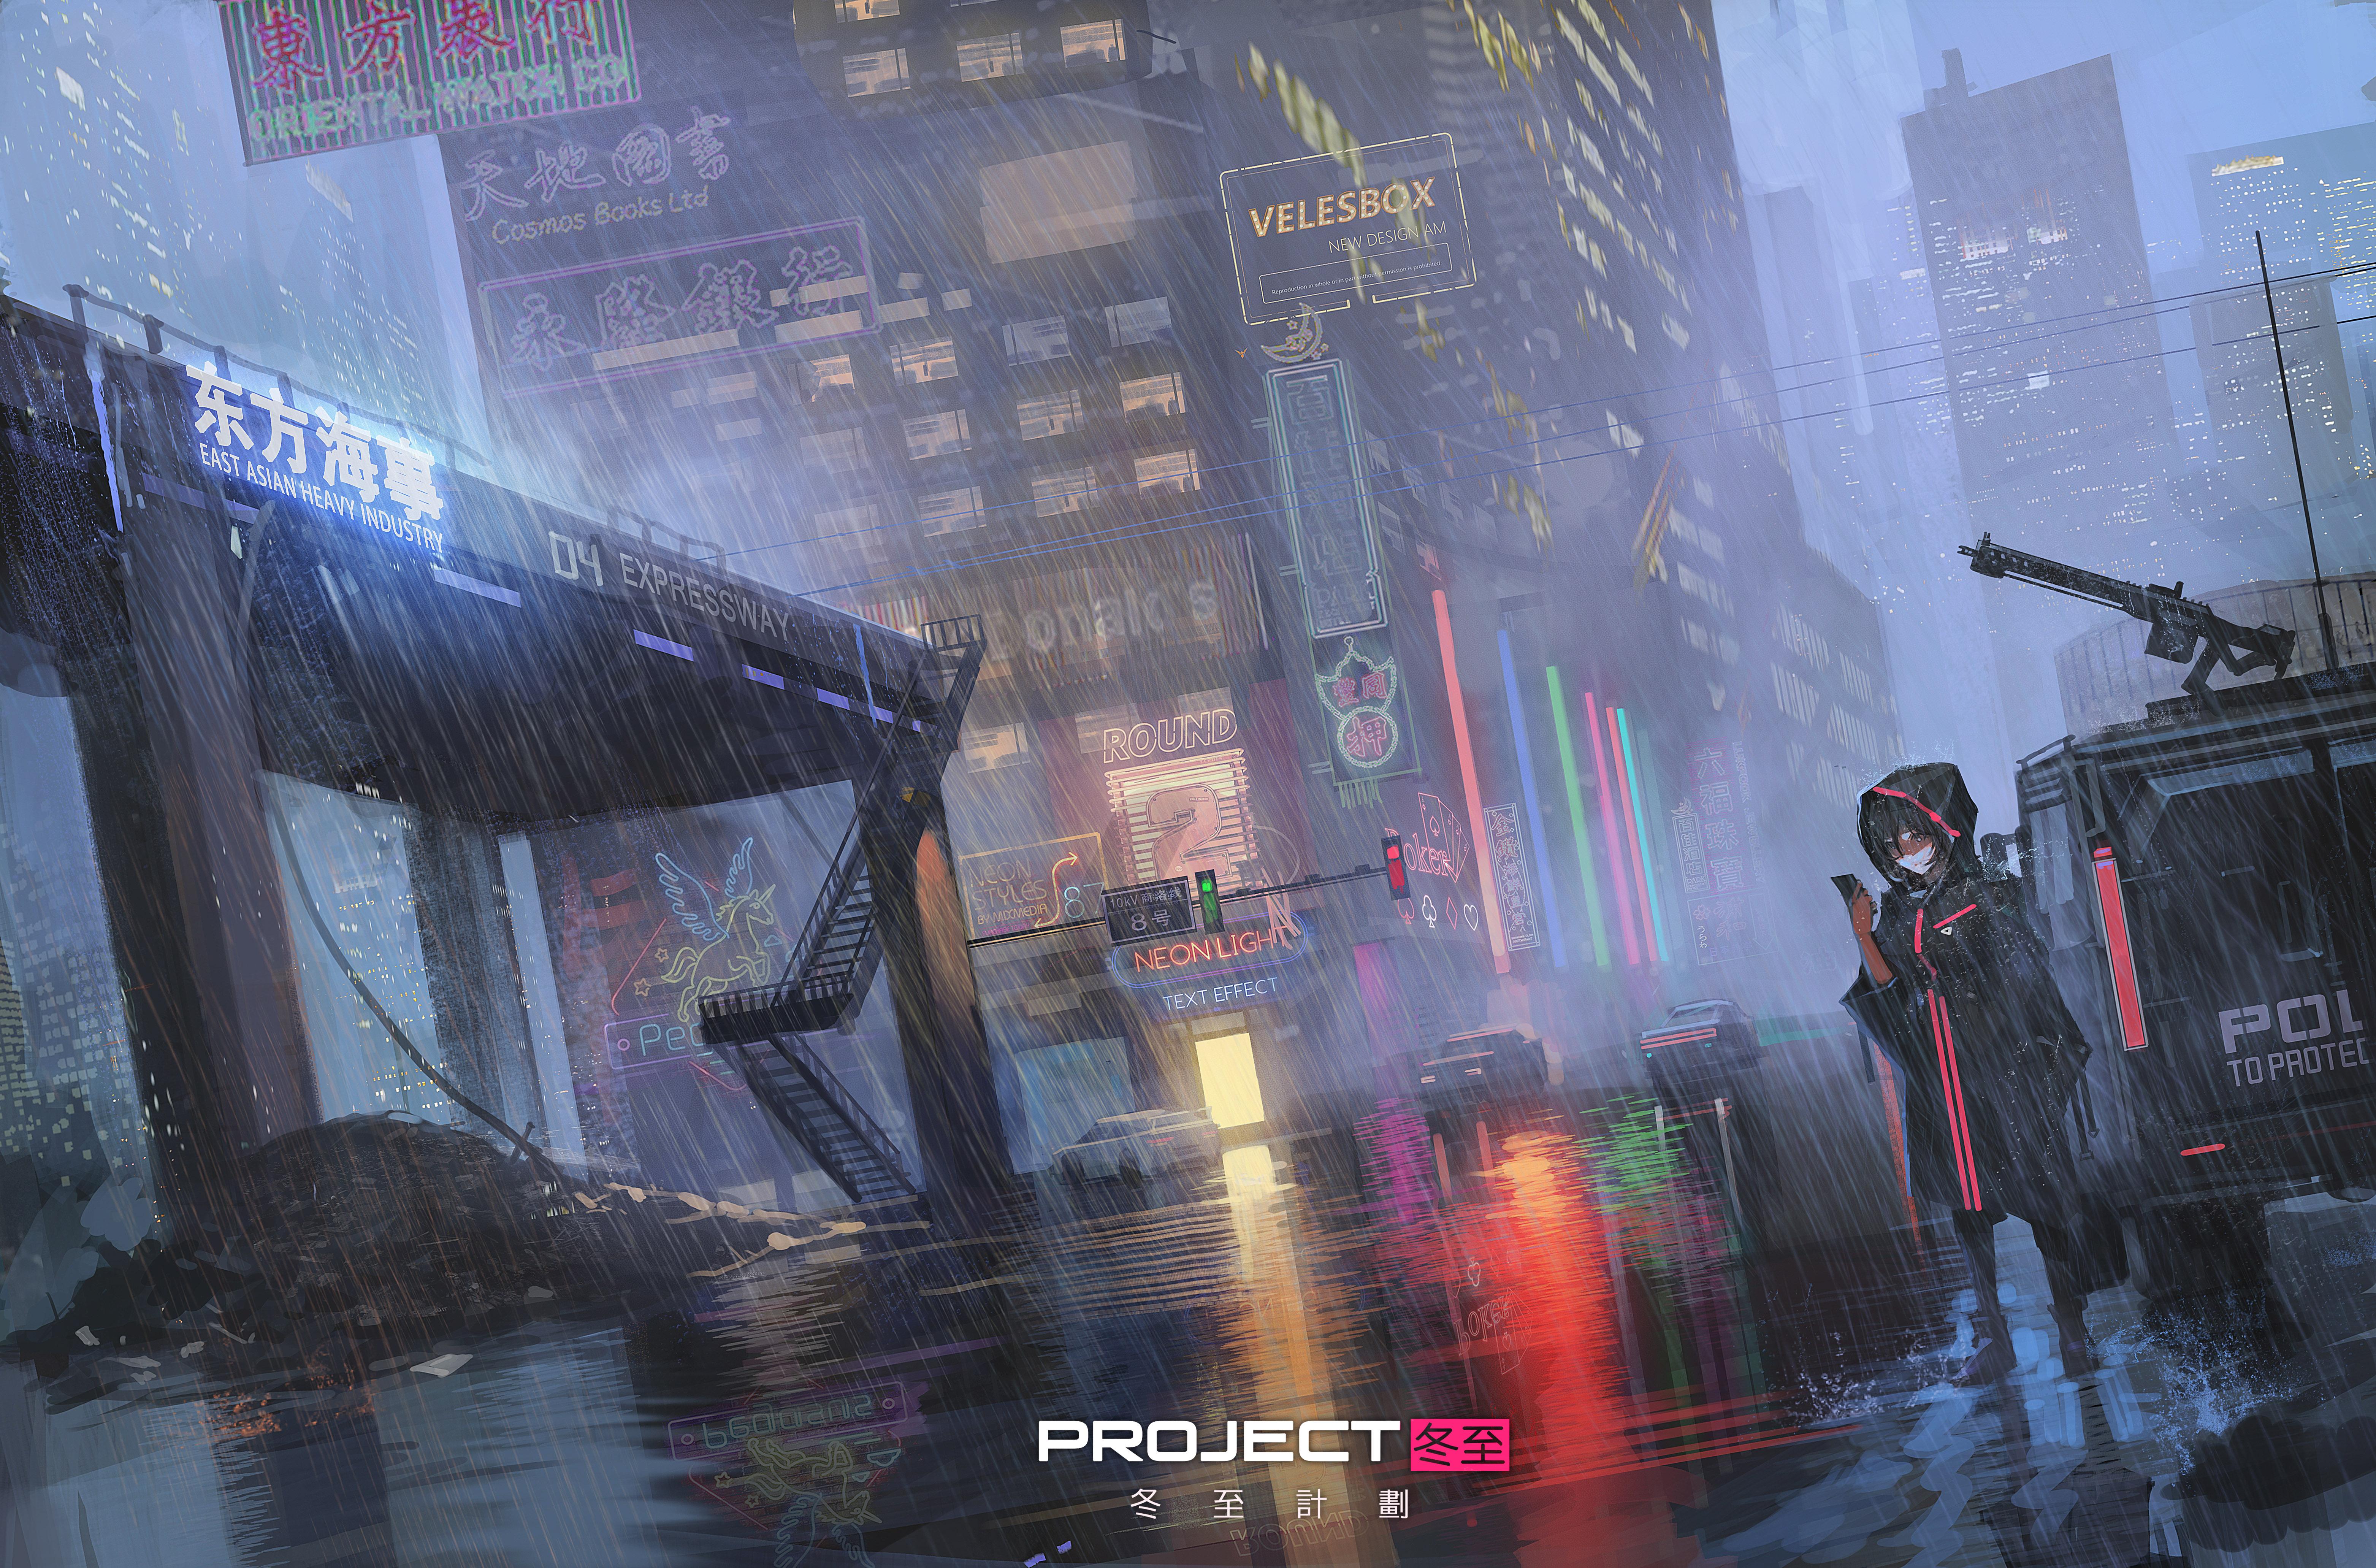 Cyberpunk Anime Girl 5k Hd Anime 4k Wallpapers Images